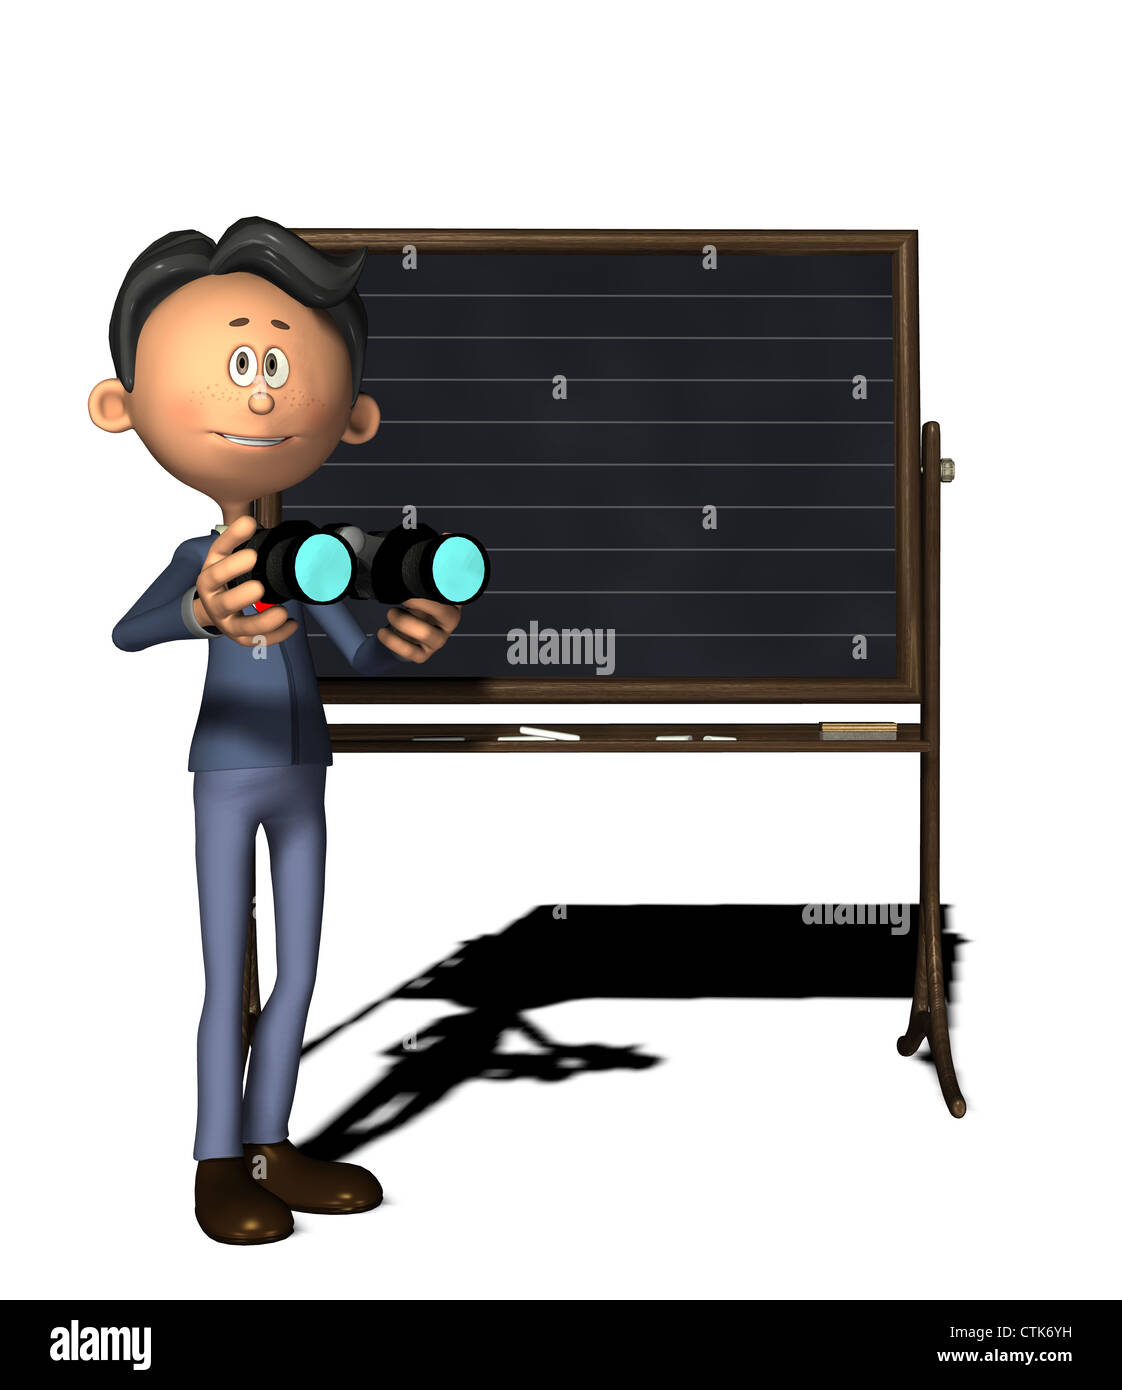 Cartoon-Figur Physiklehrer mit Fernglas Stockfoto